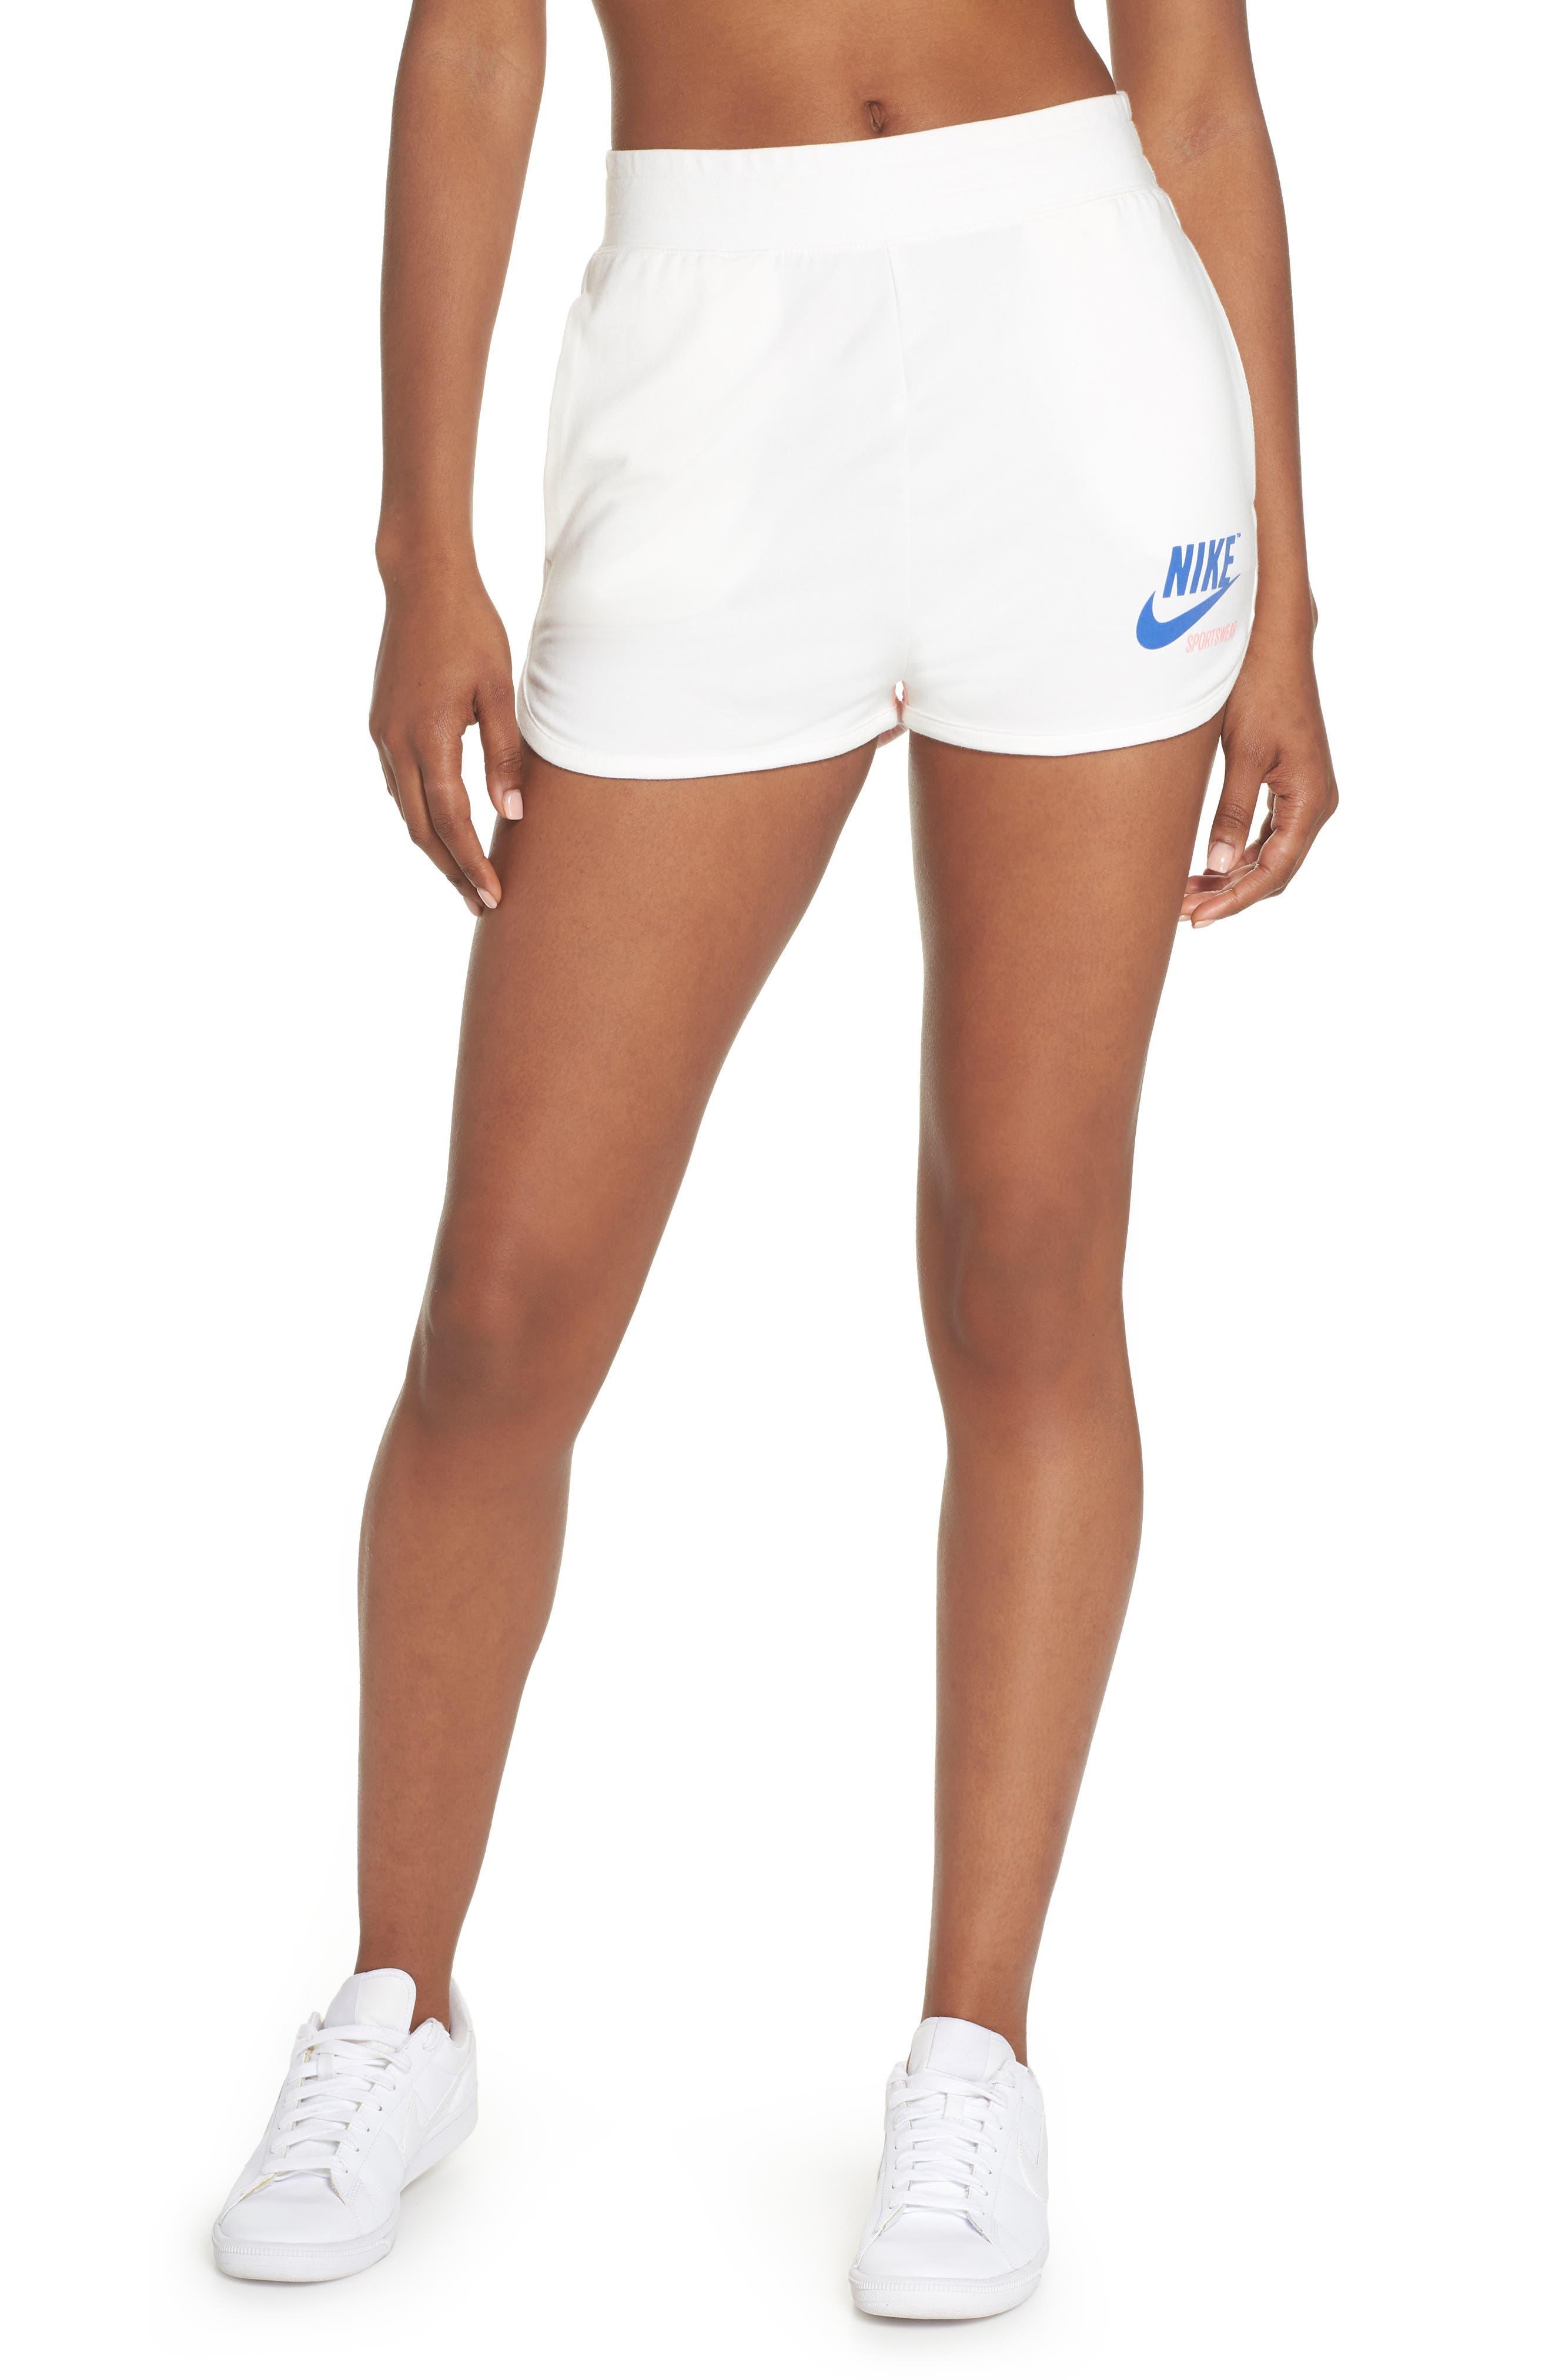 NIKE,                             Sportswear High Waist Archive Shorts,                             Main thumbnail 1, color,                             900